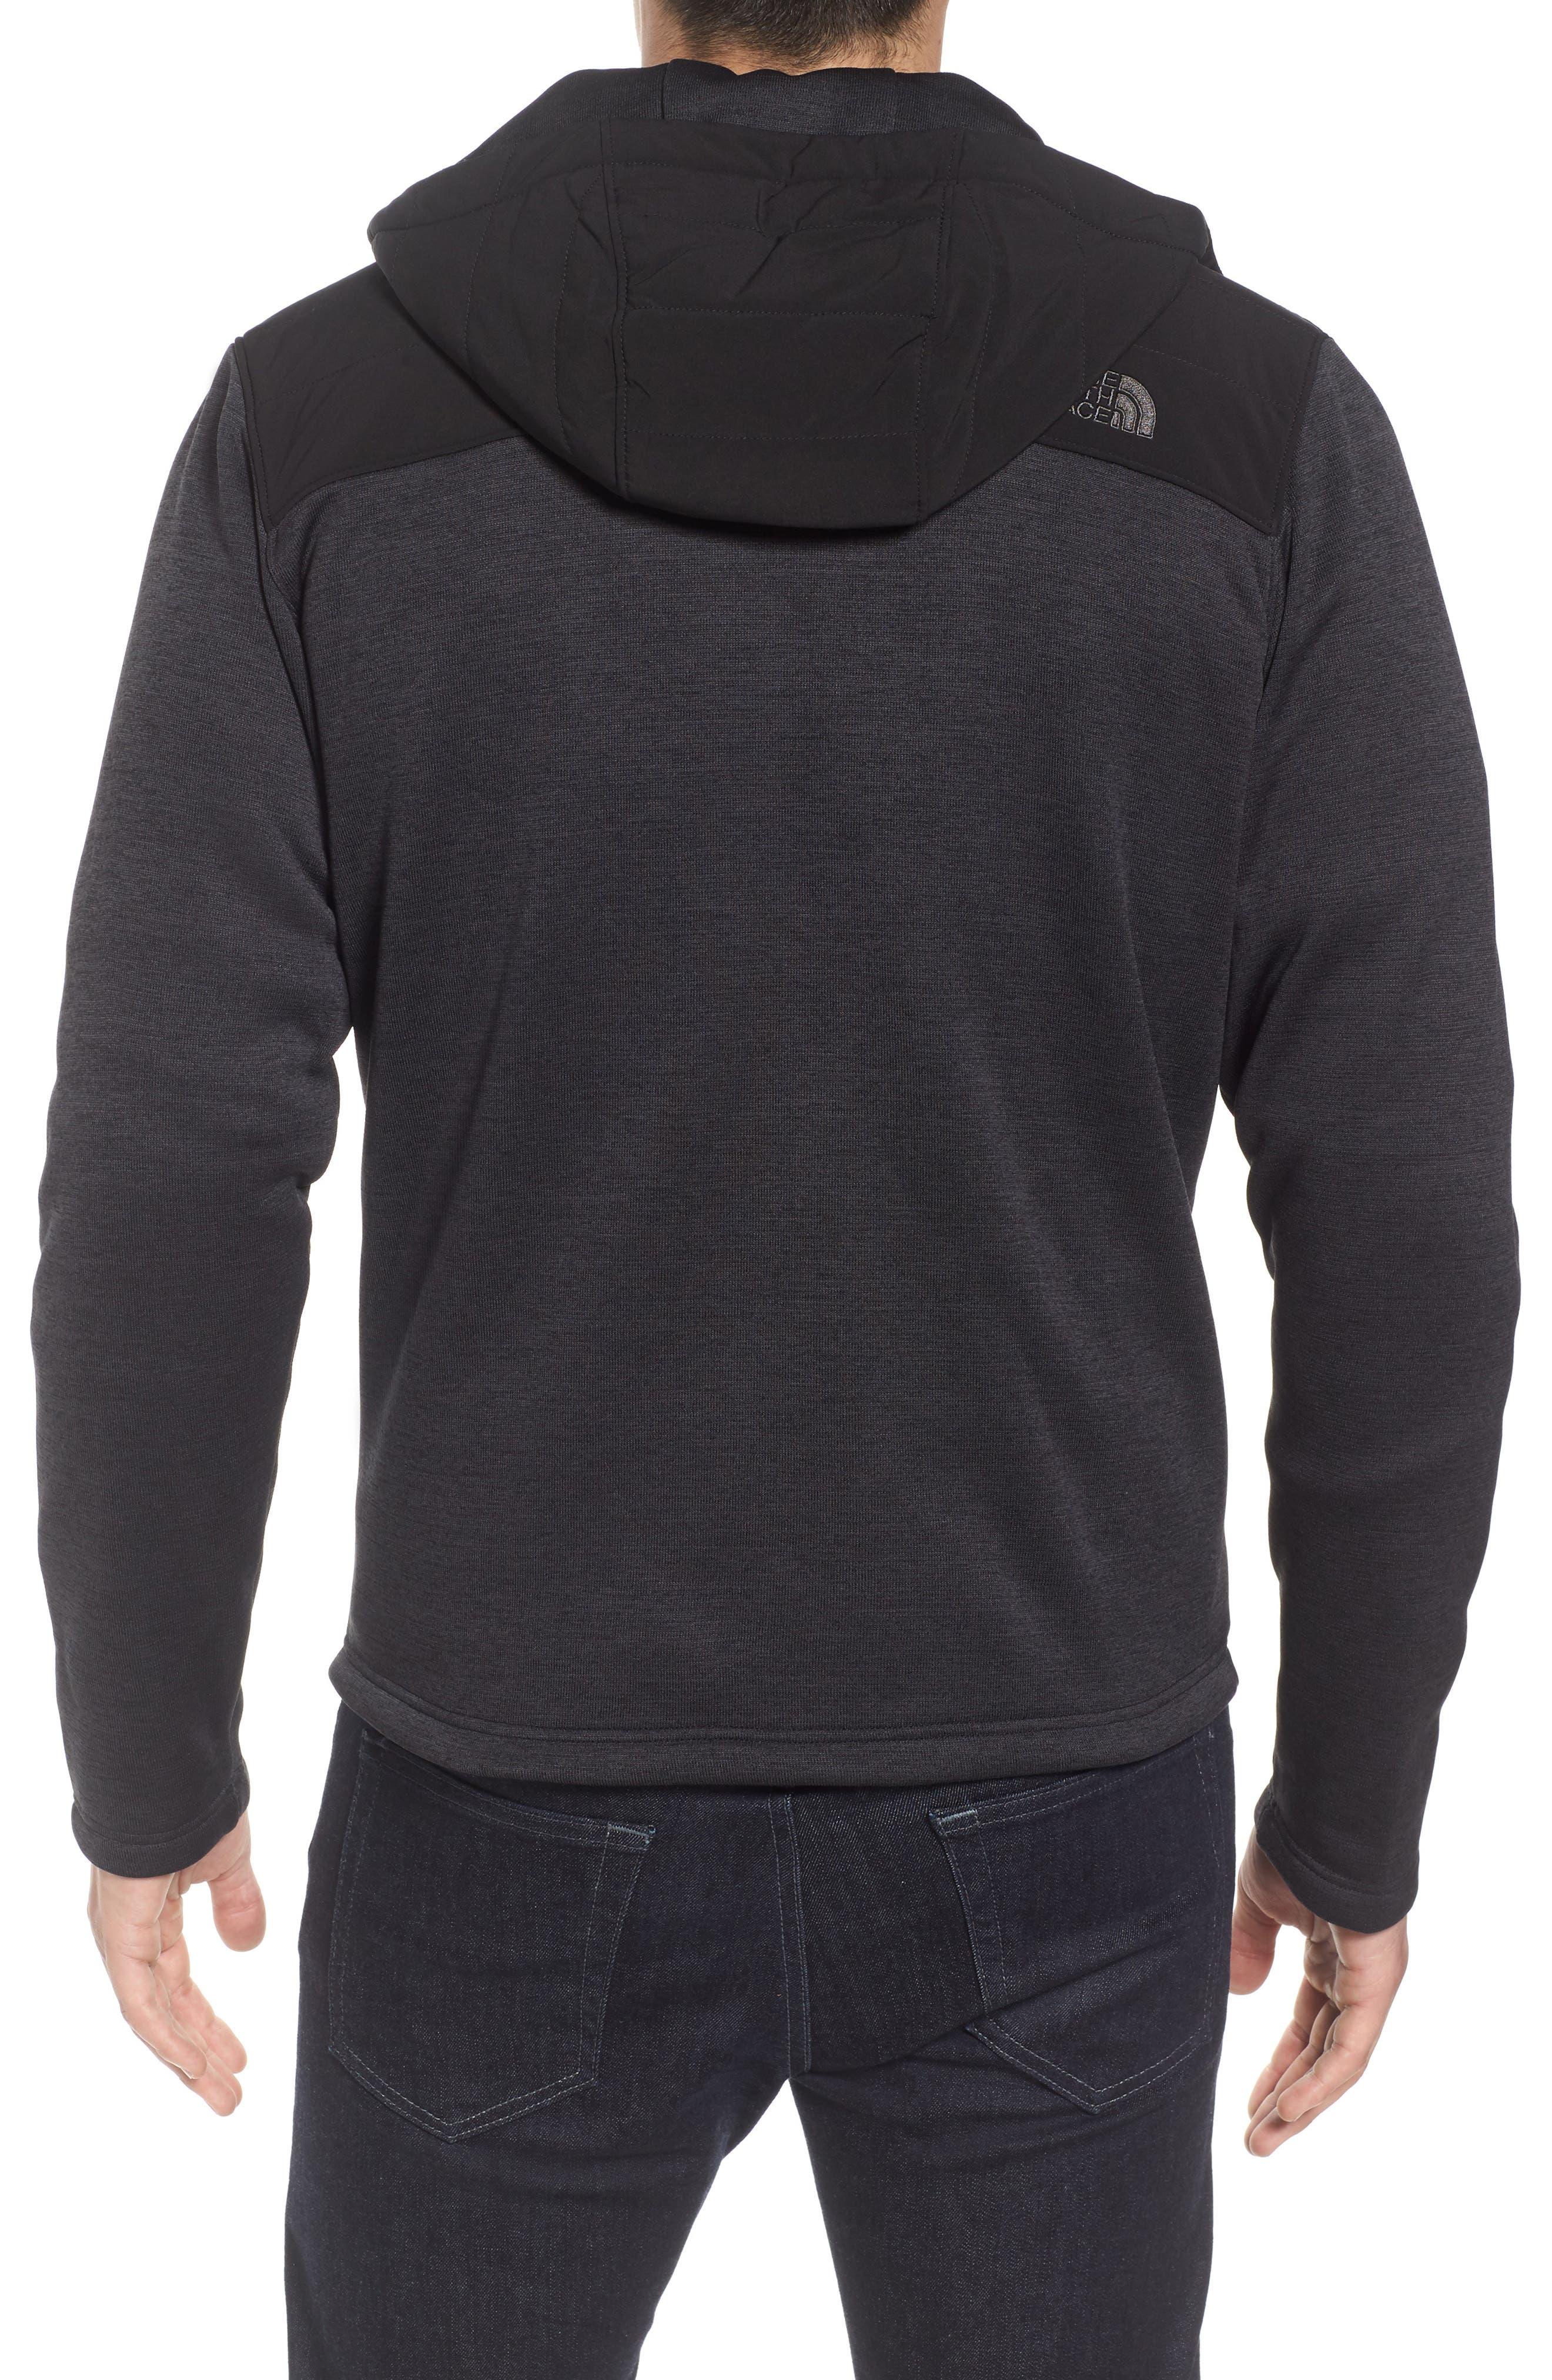 Norris Insulated Fleece Jacket,                             Alternate thumbnail 2, color,